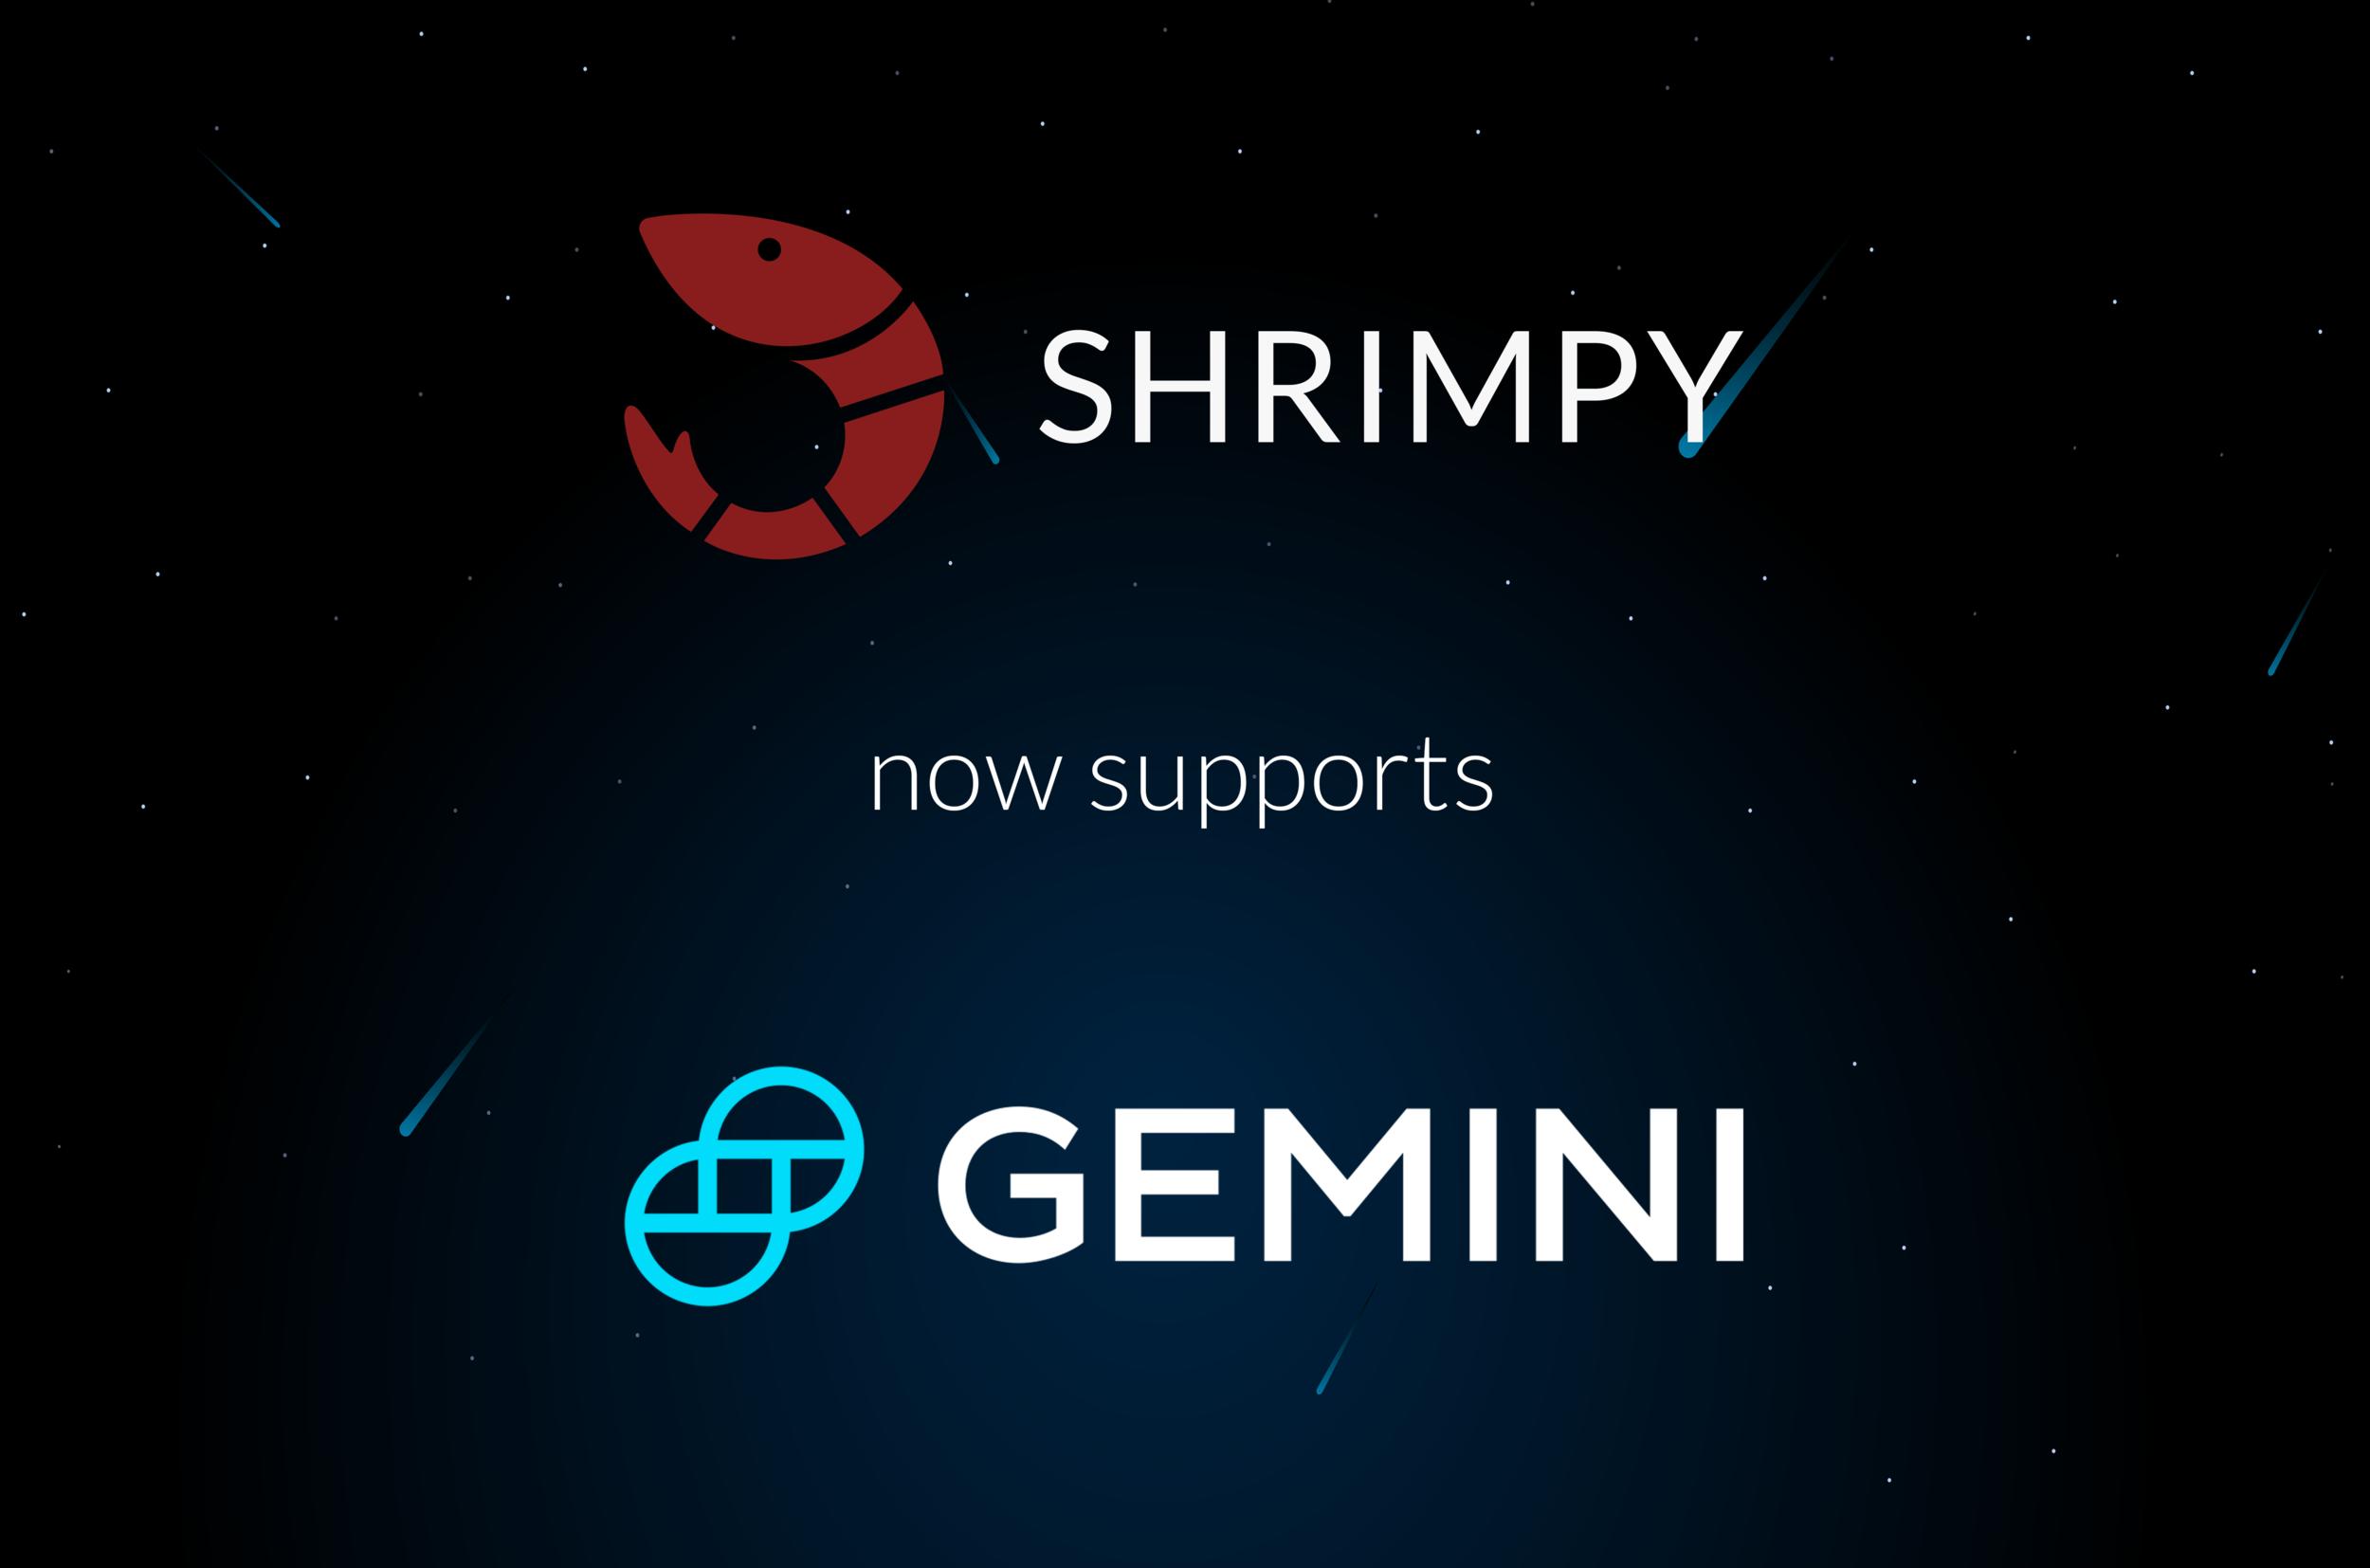 shrimpy-supports-gemini